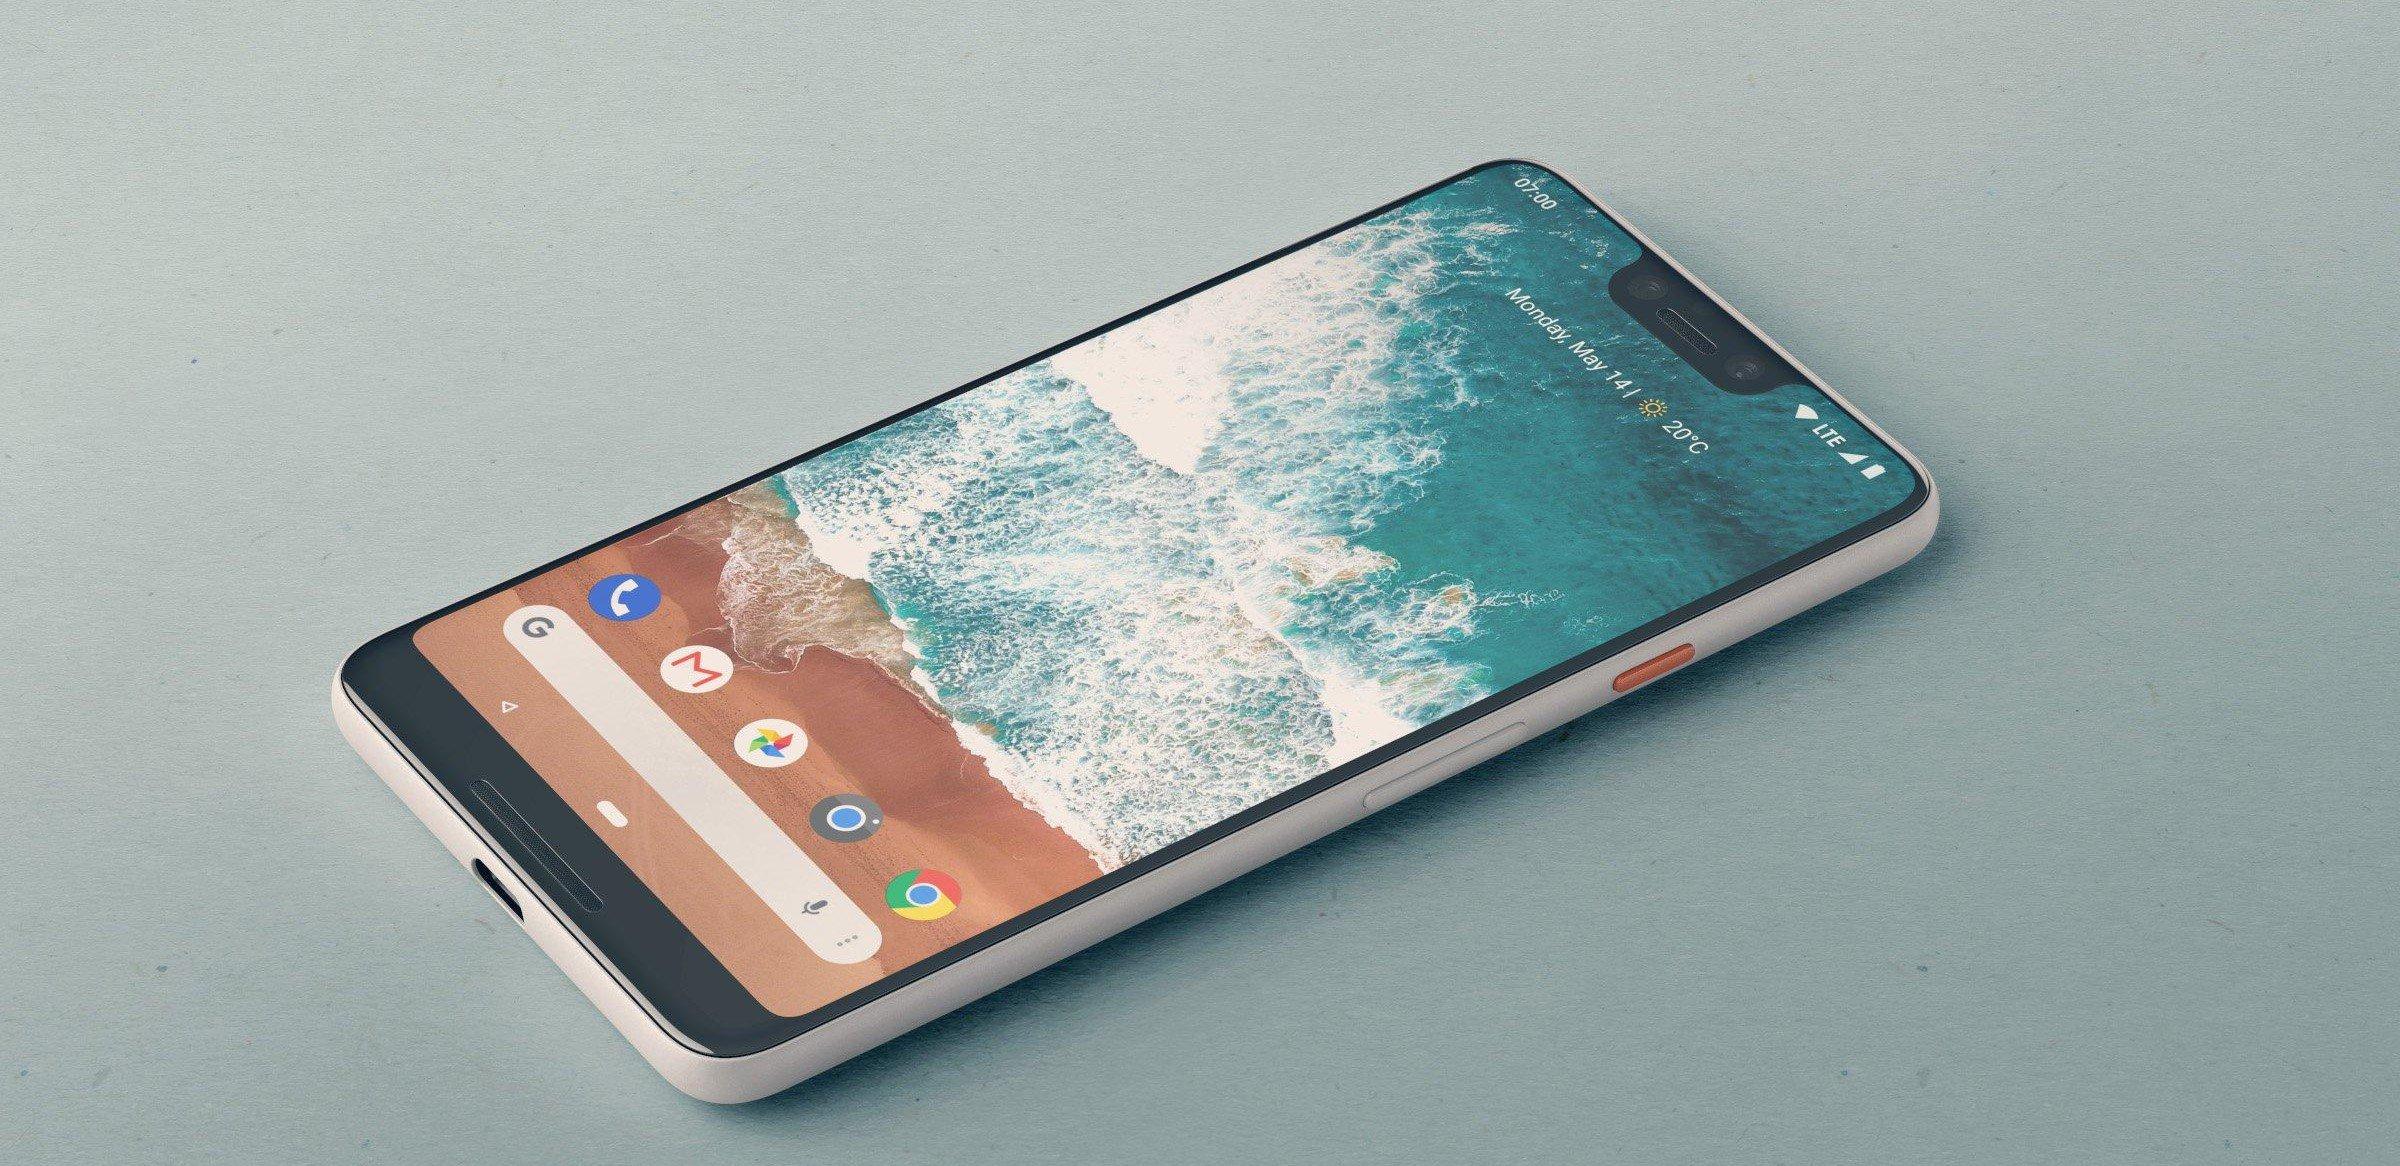 Google Pixel 3 XL Top 5 Best Mobile Brands In USA [In 2019 Updates]